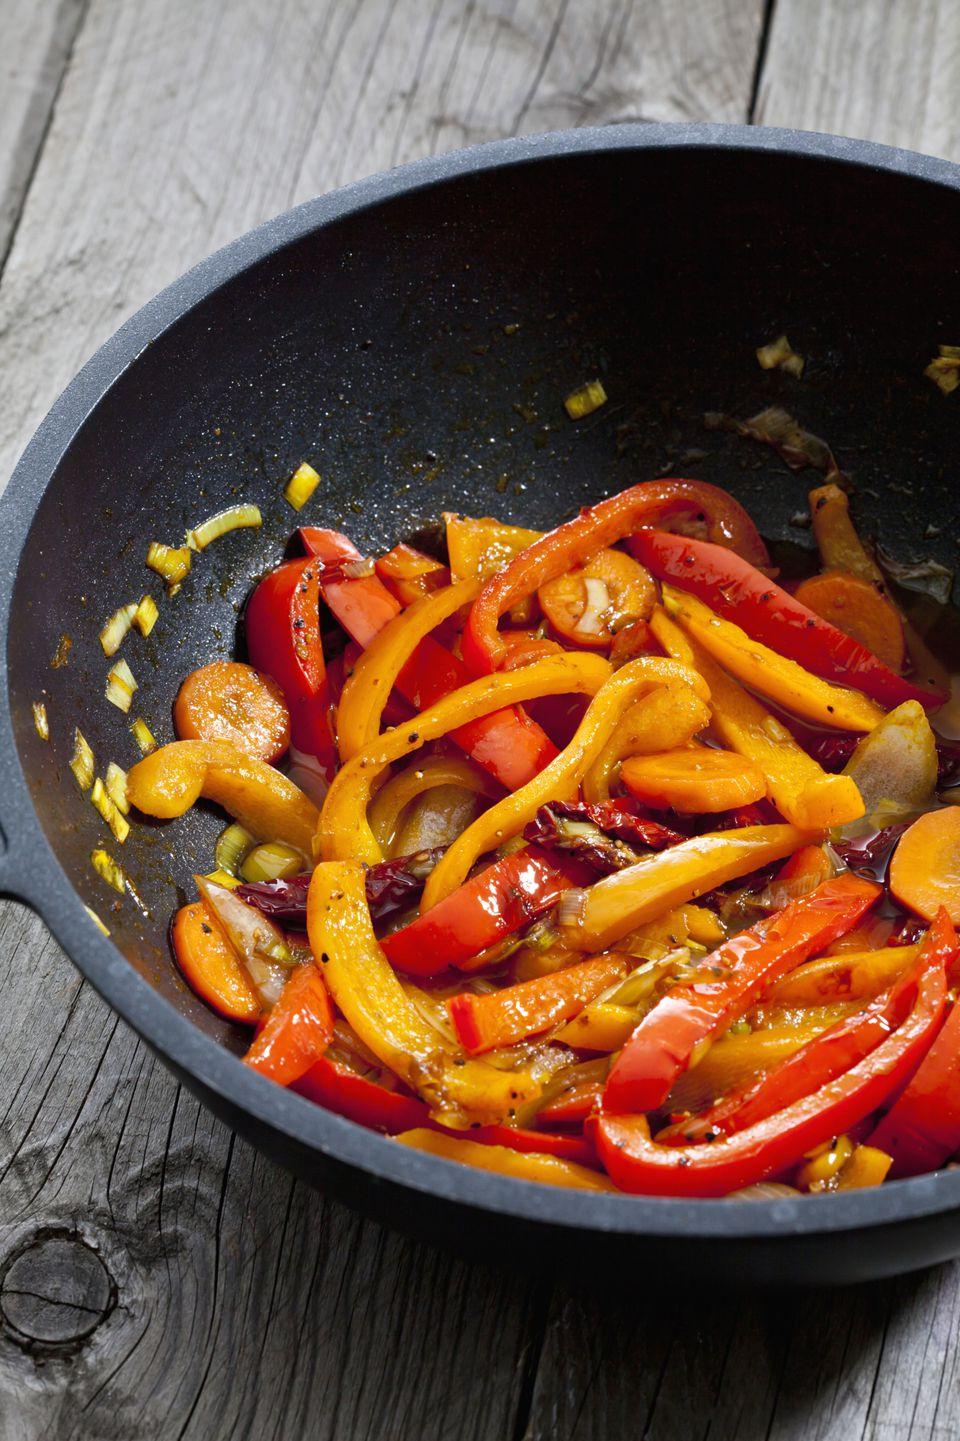 Cooking up some vegetarian bell pepper fajitas!